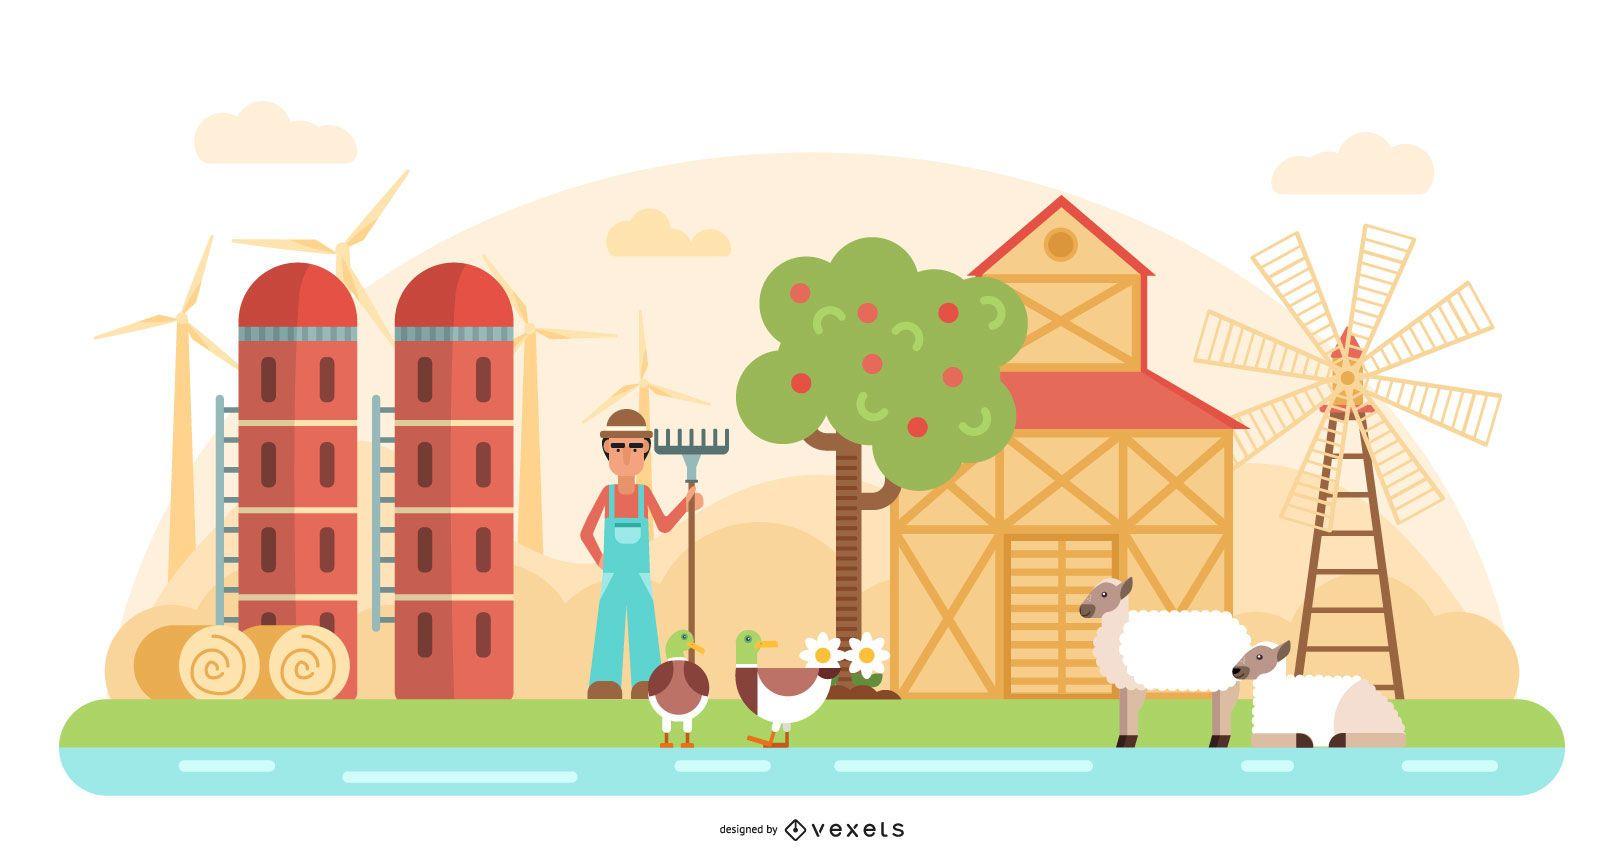 Farmer Scene Vector Illustration